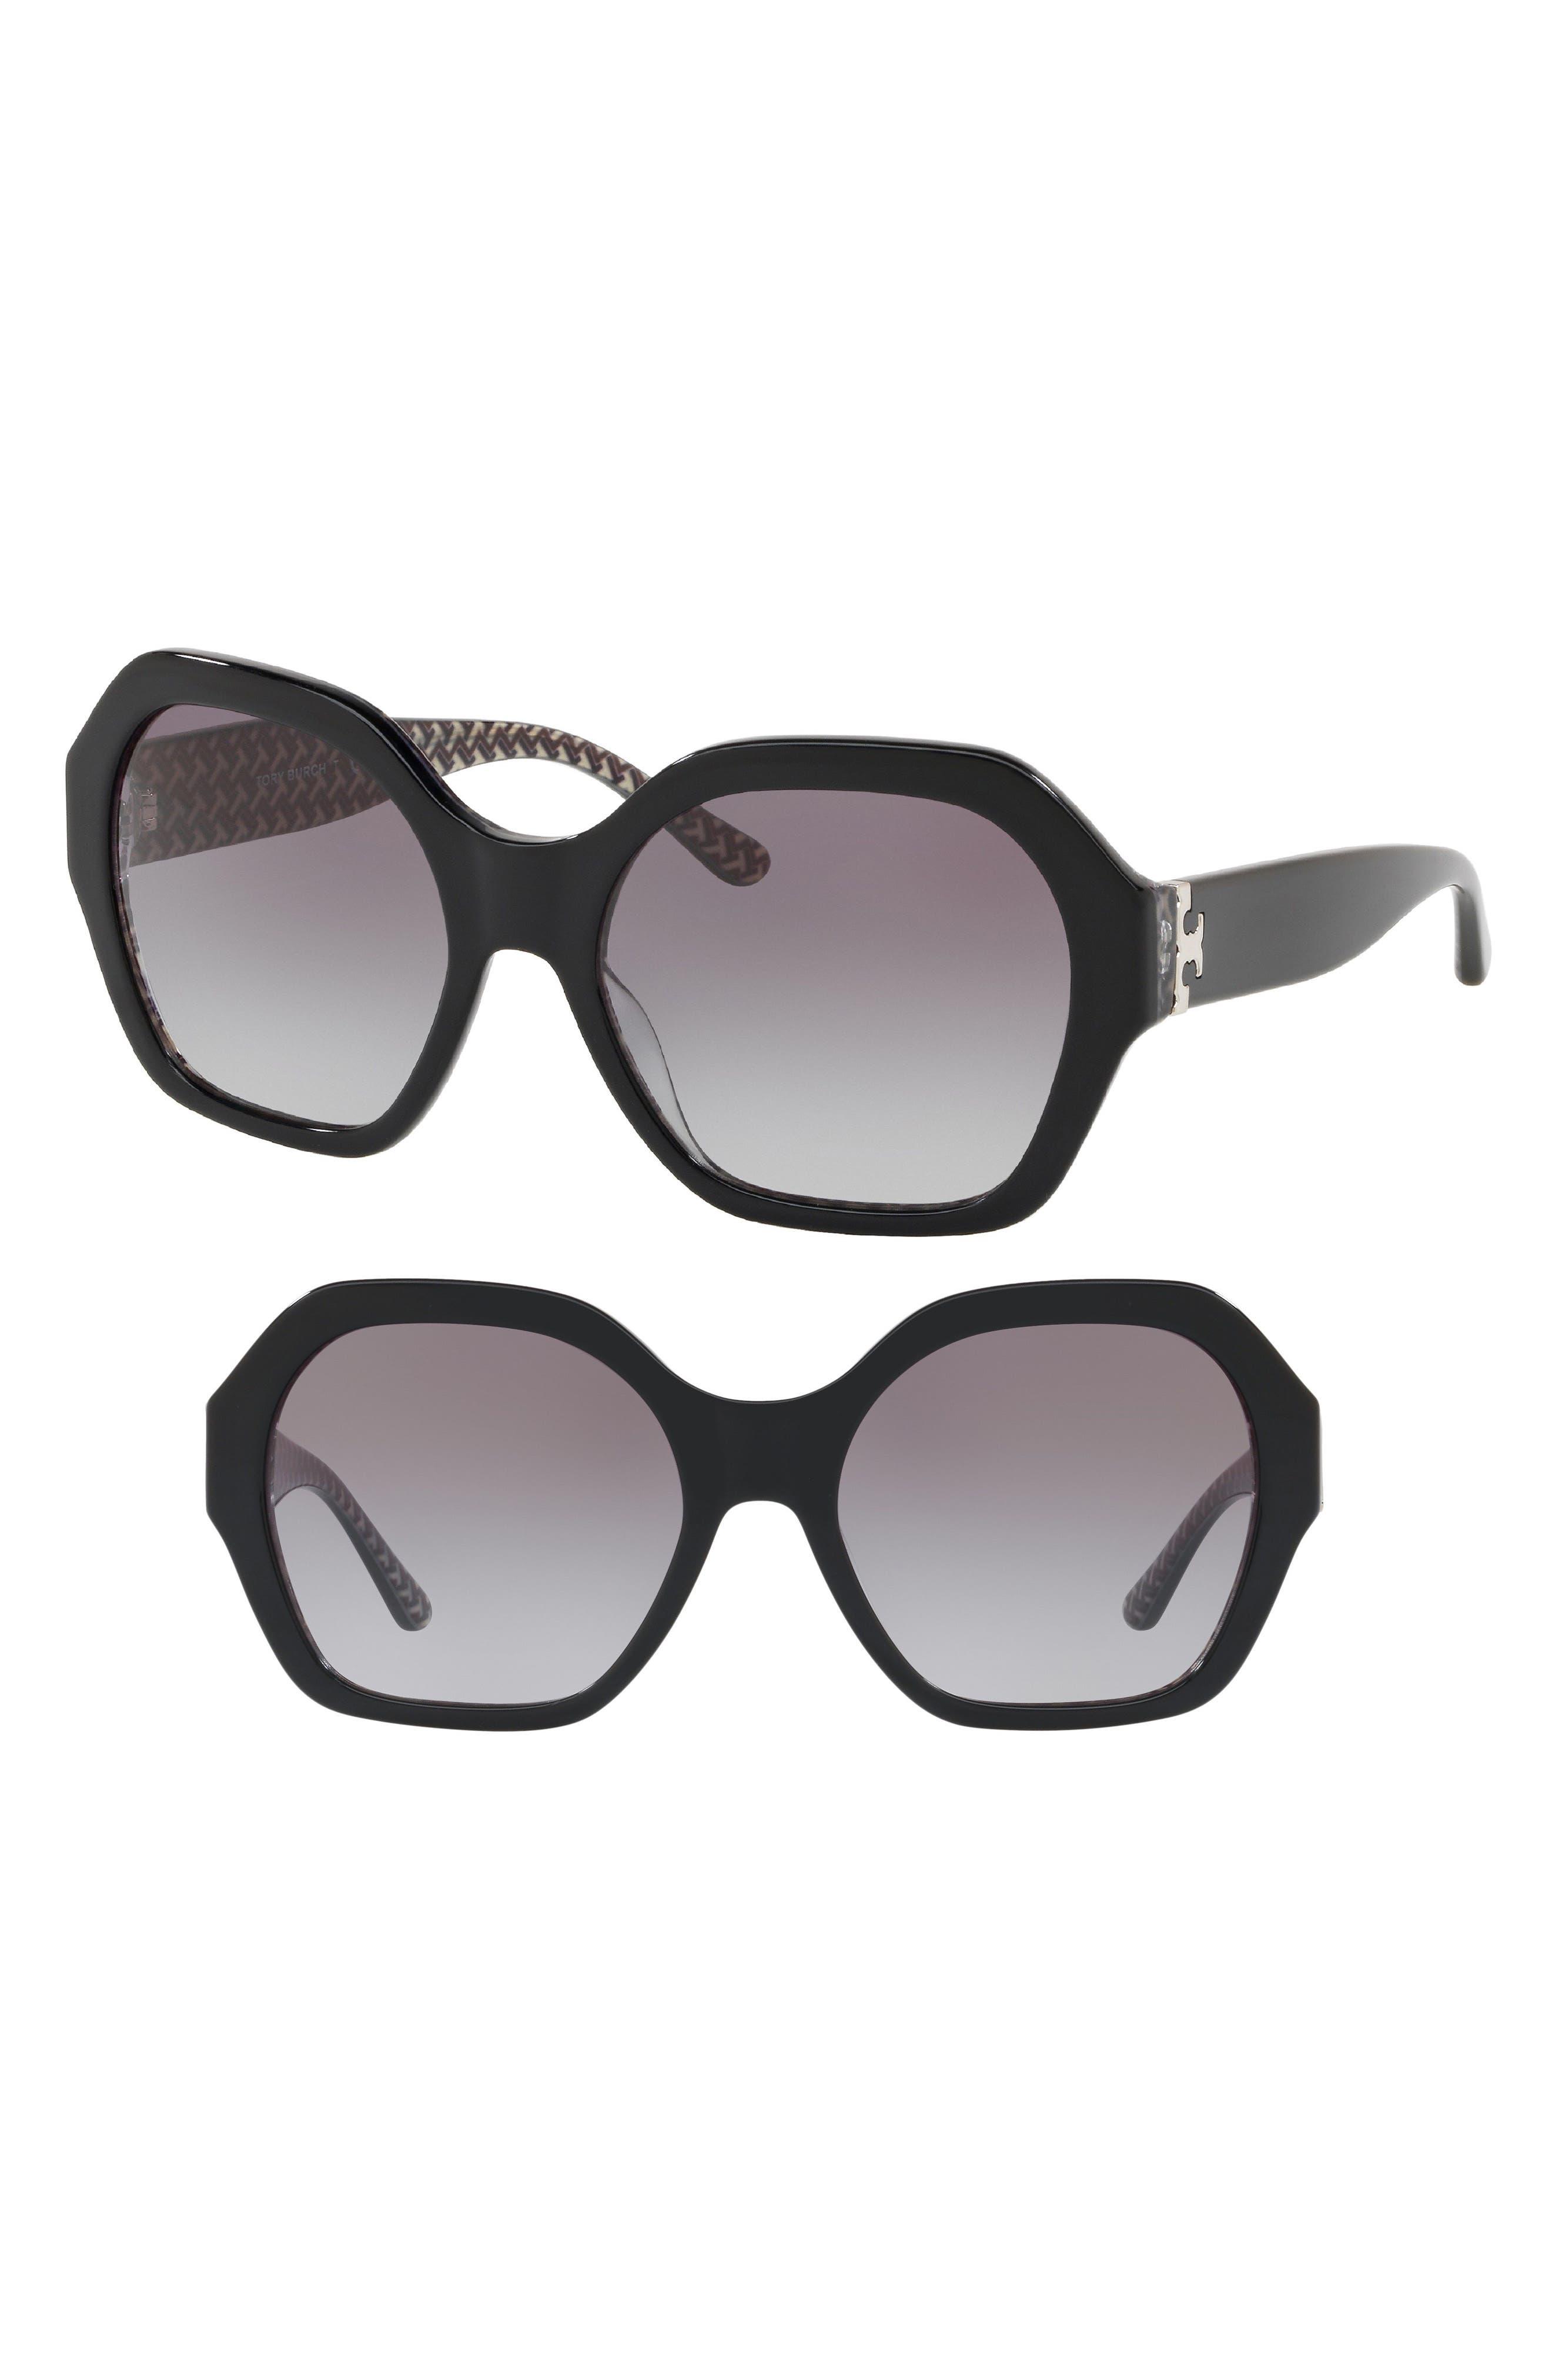 Serif T 57mm Hexagonal Sunglasses,                             Main thumbnail 1, color,                             Black